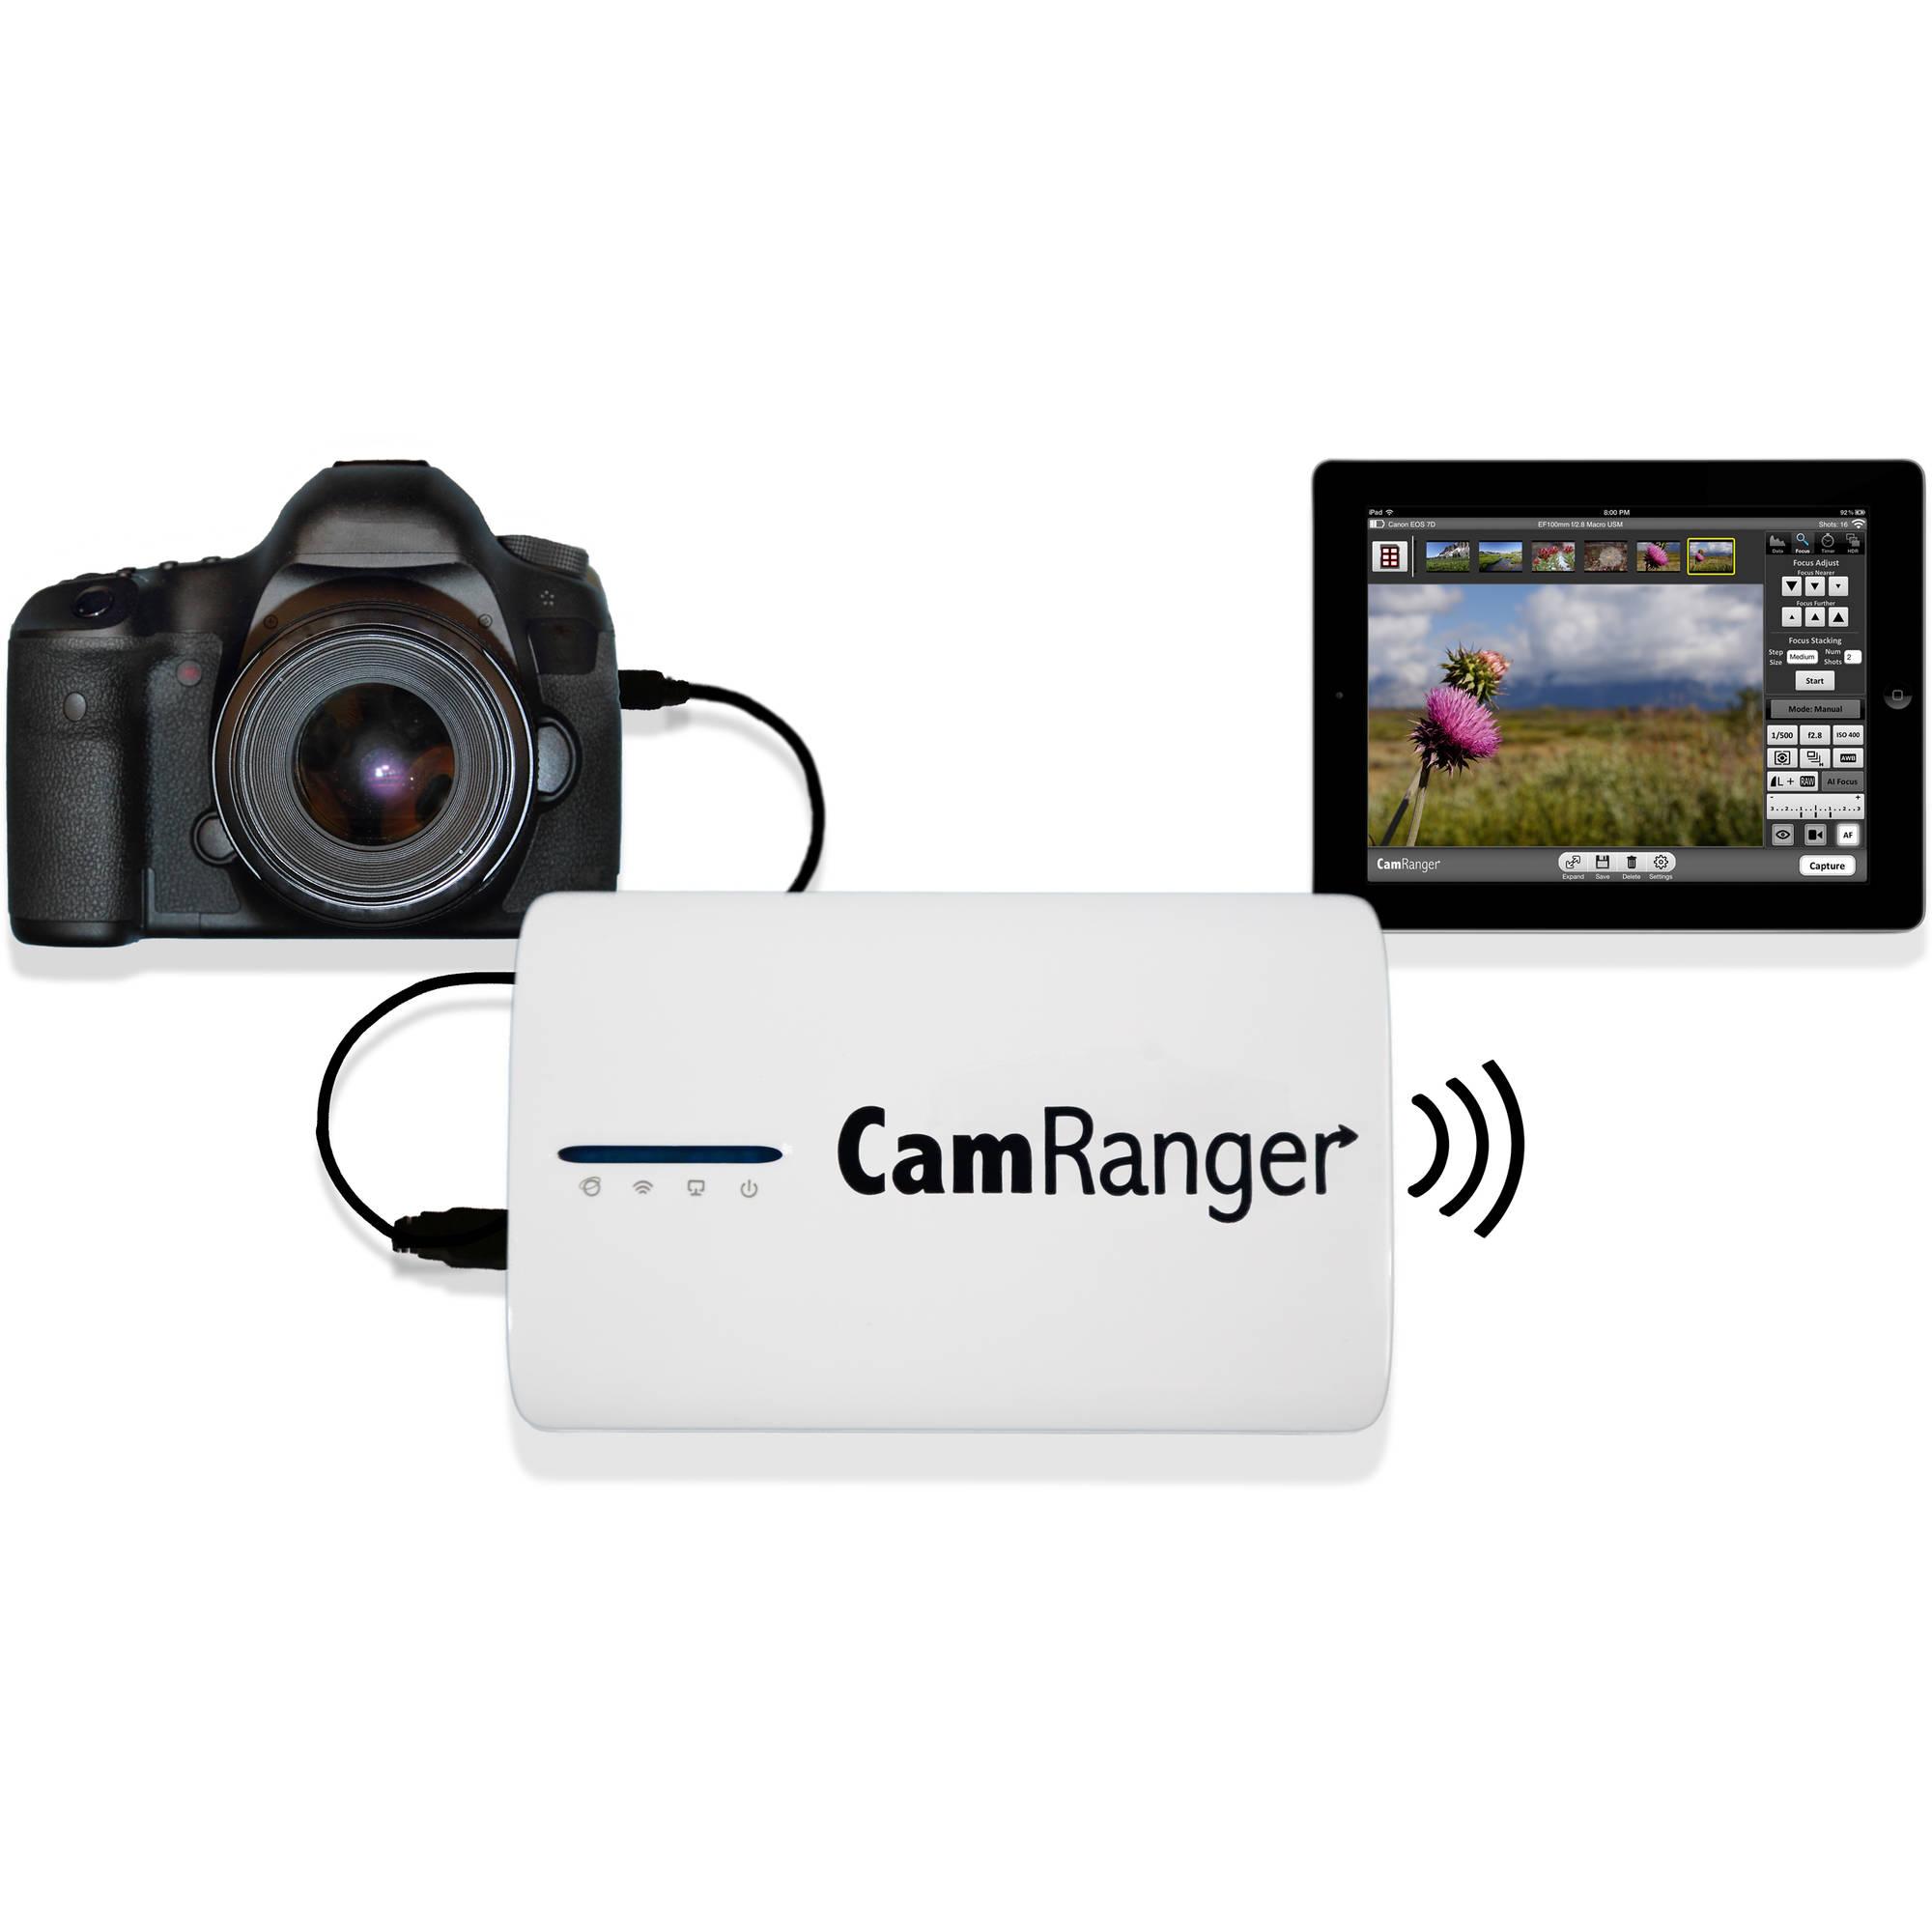 Camera Wireless Dslr Camera Control camranger wireless transmitter for select canon 1001 and nikon dslr cameras